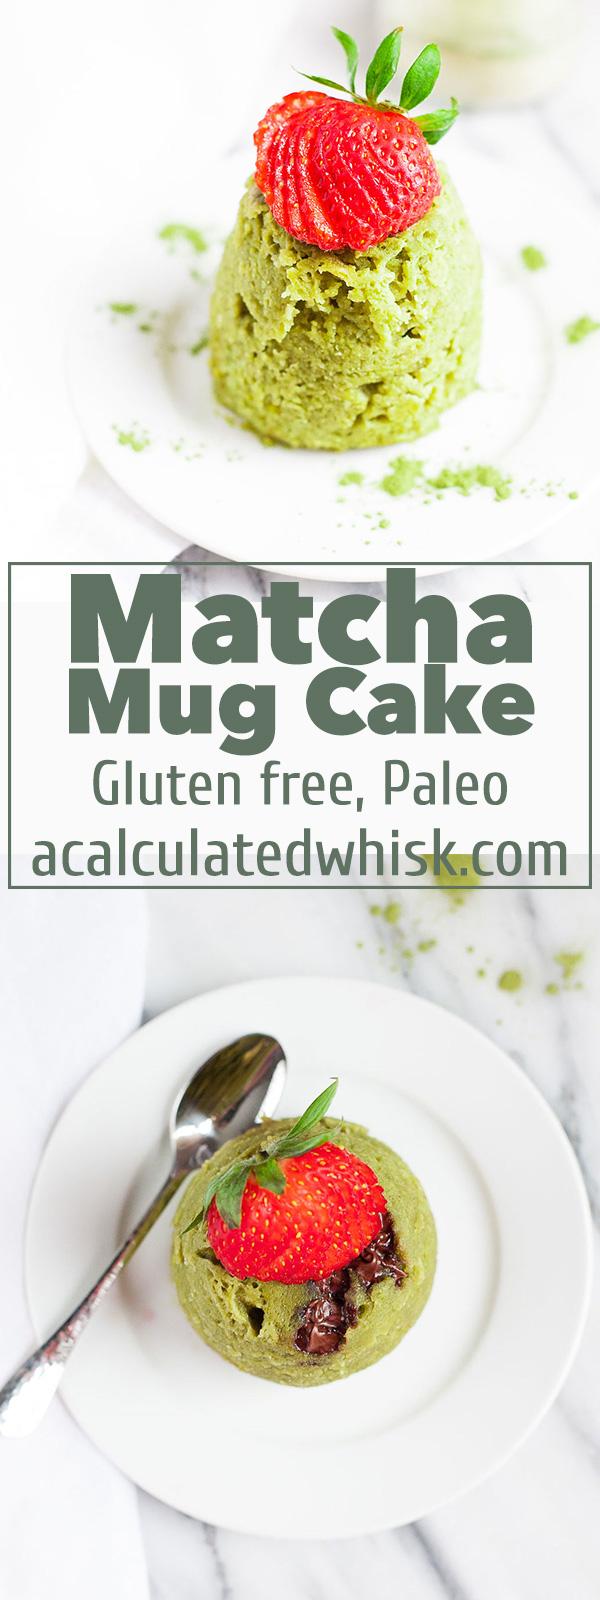 Matcha Mug Cake (Paleo, Gluten-free) | acalculatedwhisk.com